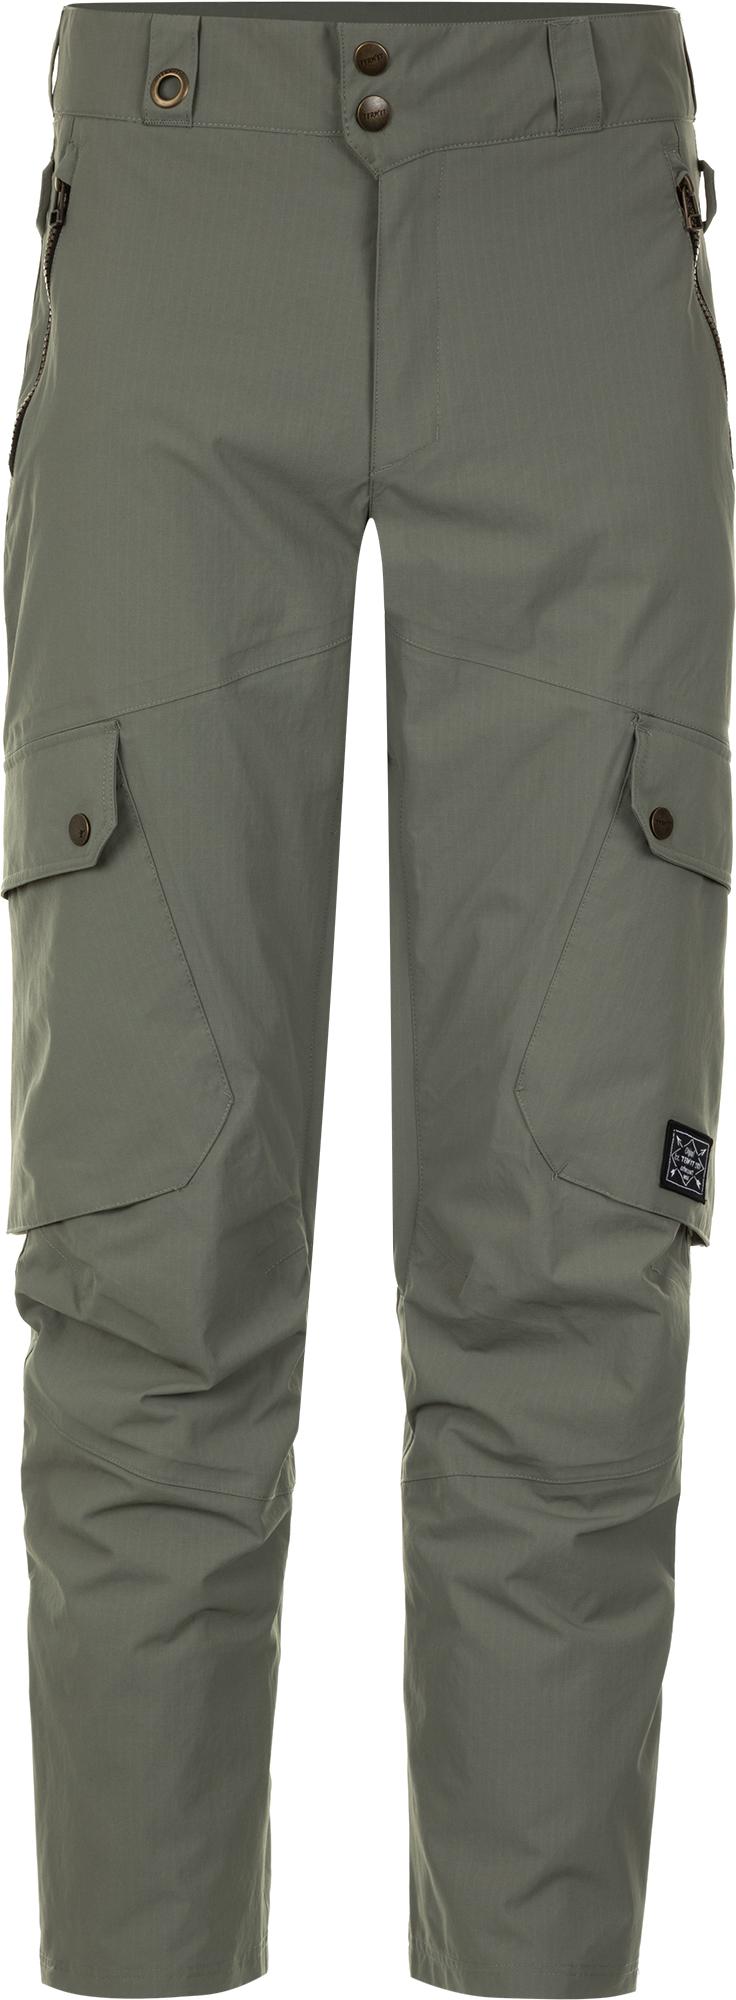 Termit Брюки утепленные мужские Termit, размер 54 брюки мужские sela цвет темно серый меланж pk 2415 012 8310 размер xxl 54